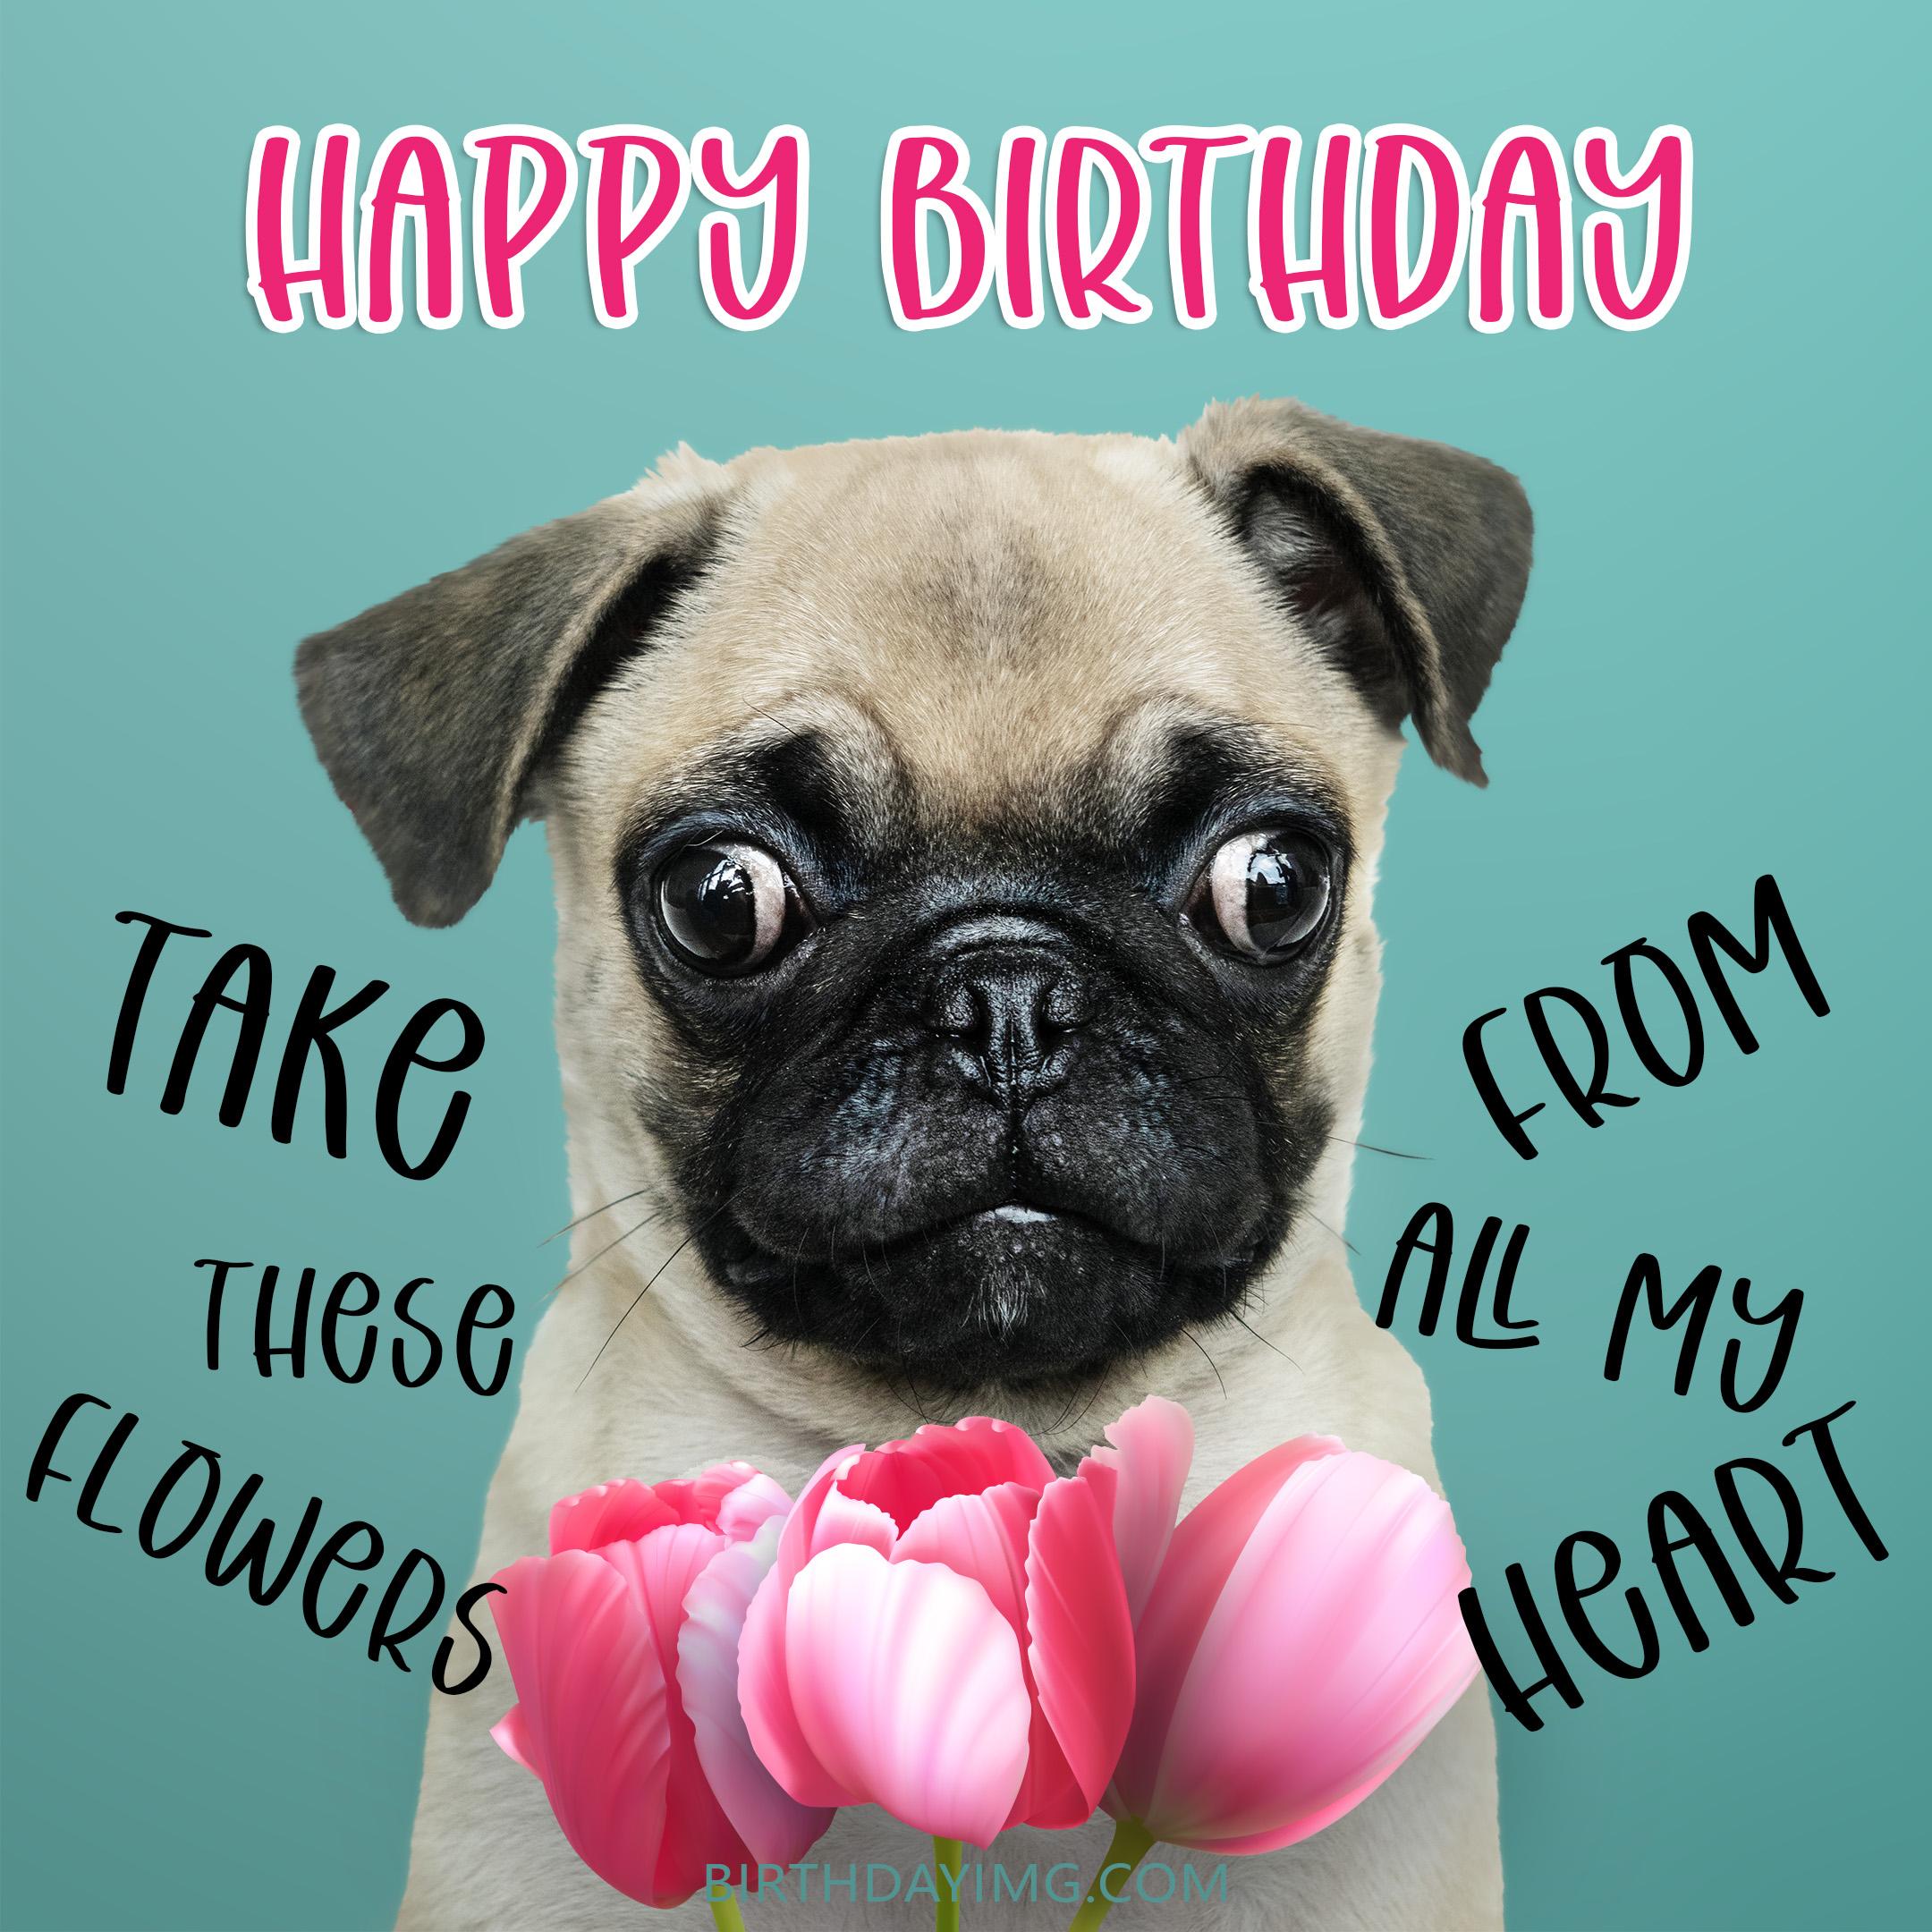 Free Funny Happy Birthday Image With Flowers And Dog - birthdayimg.com